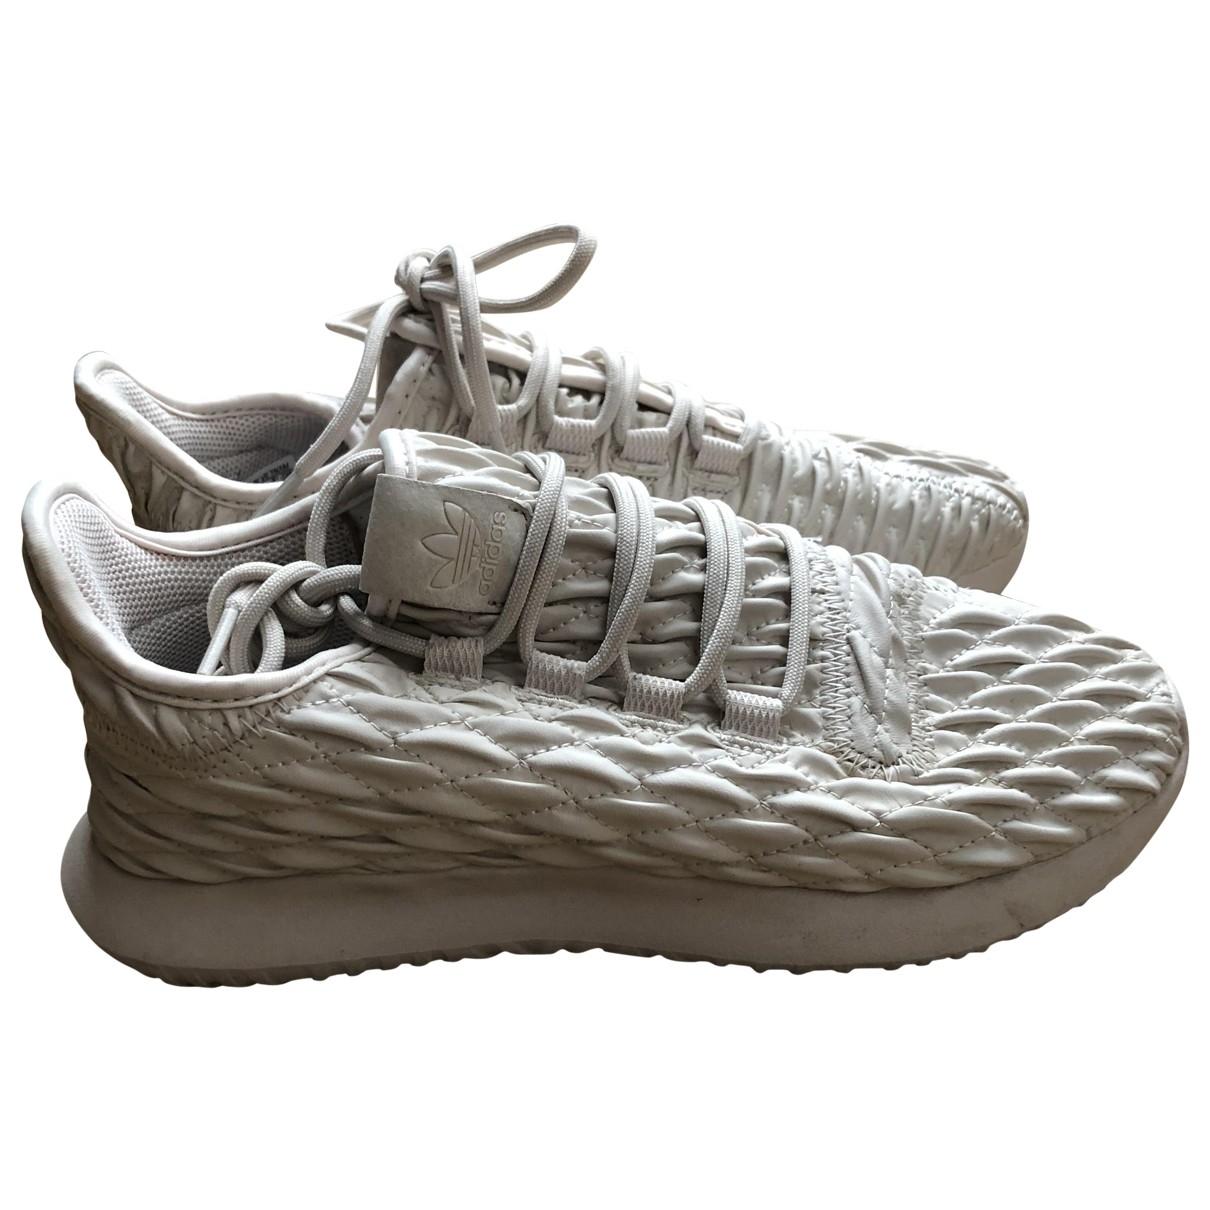 Adidas - Baskets Tubular pour femme - beige